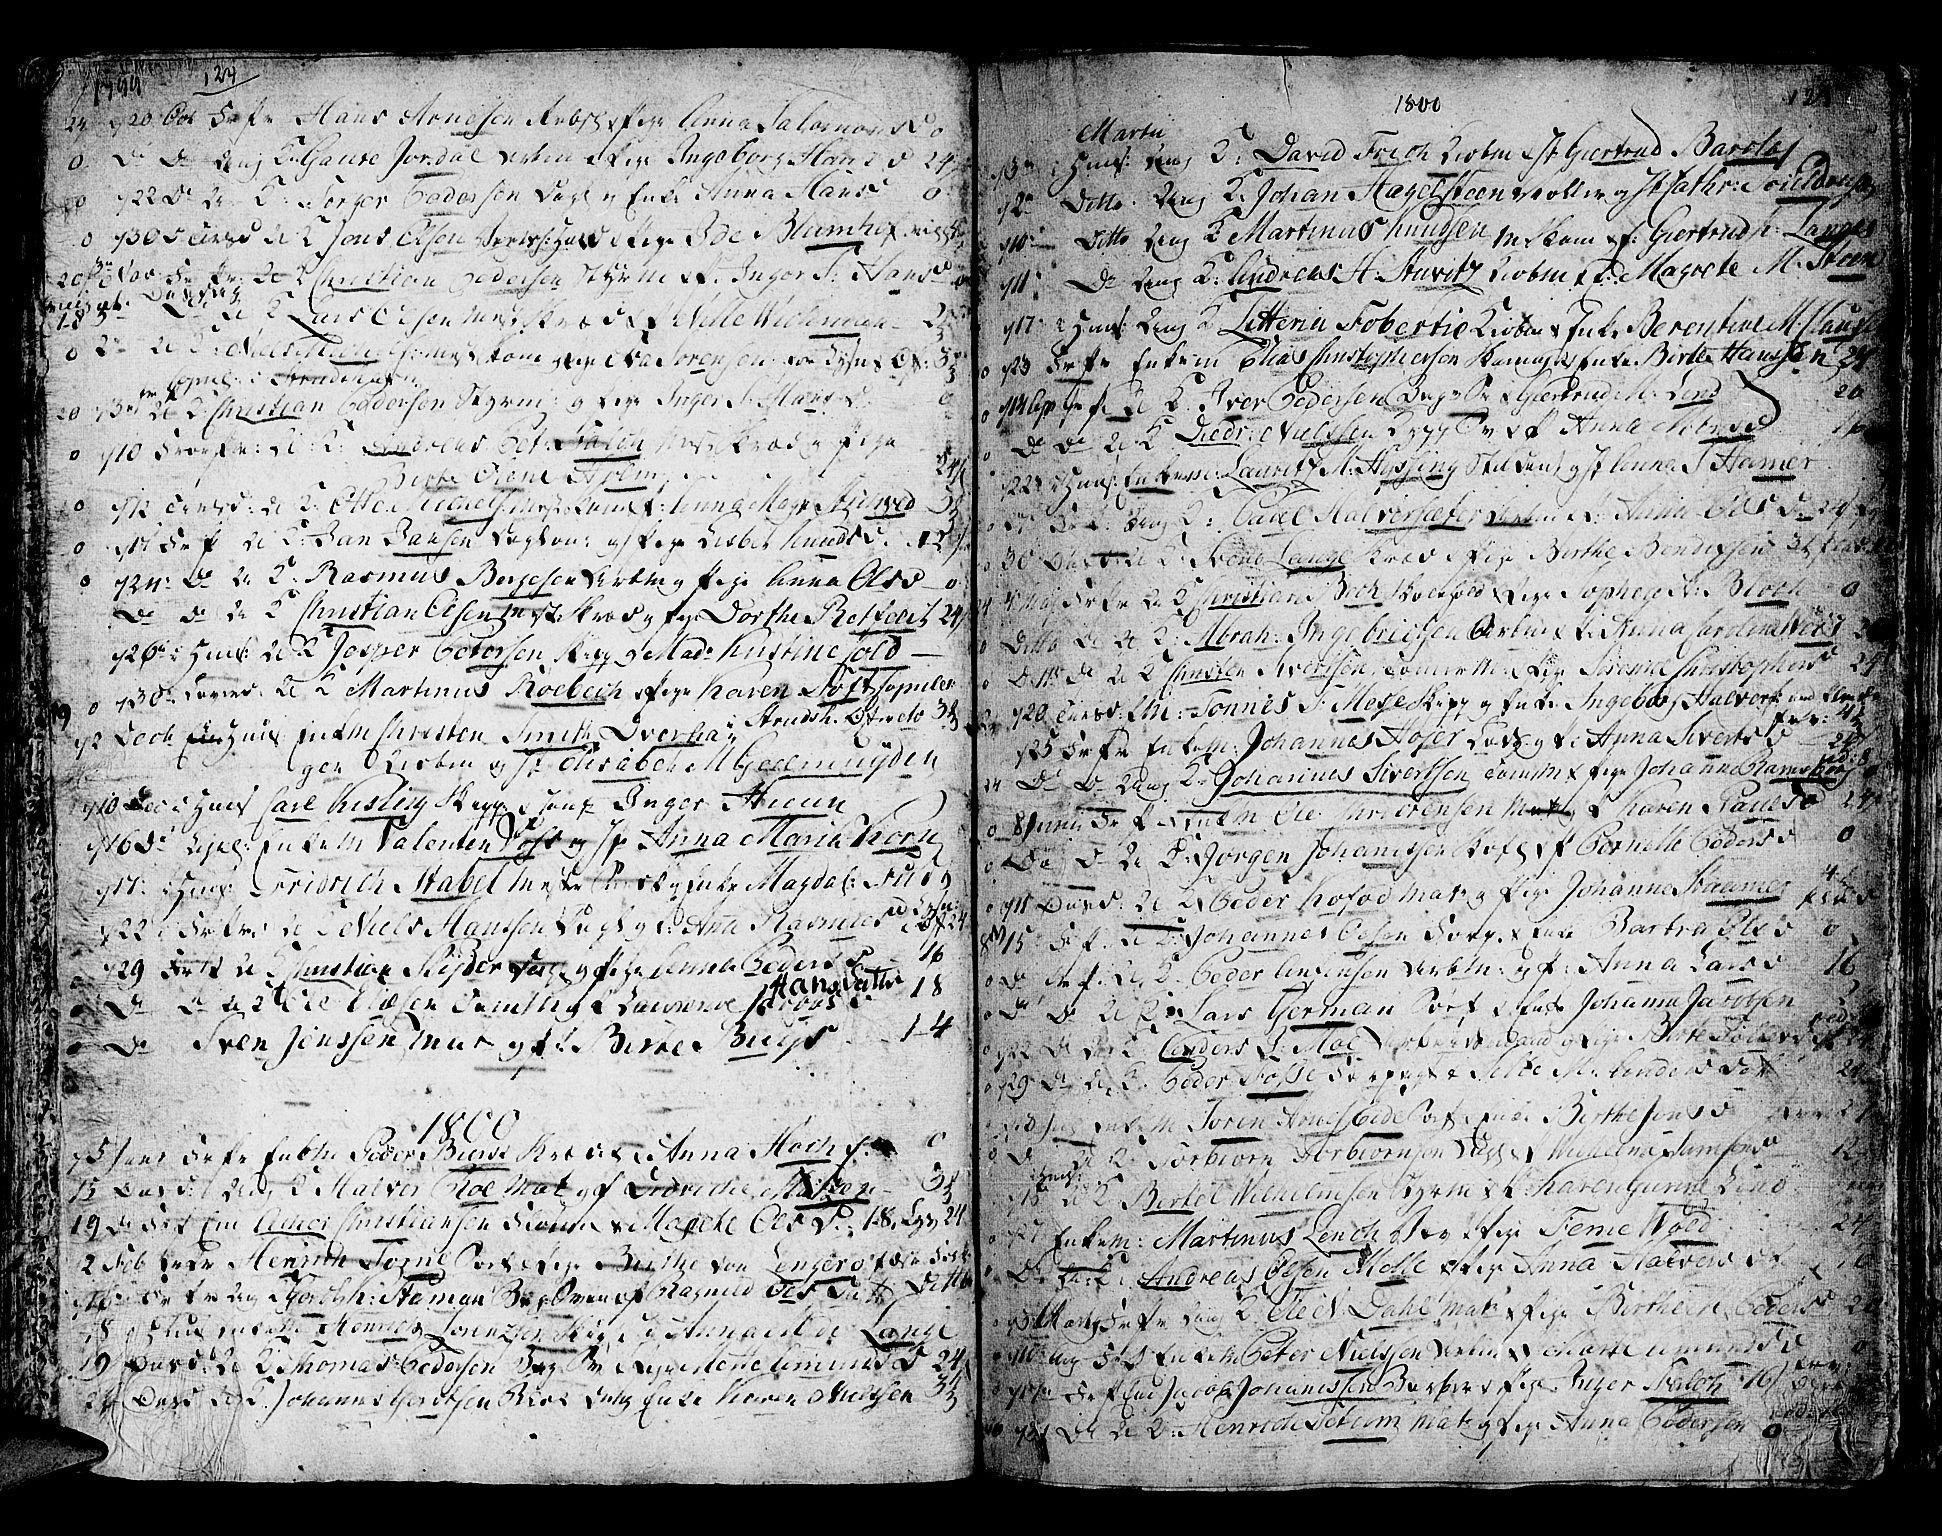 SAB, Domkirken Sokneprestembete, H/Haa/L0007: Parish register (official) no. A 7, 1725-1826, p. 124-125